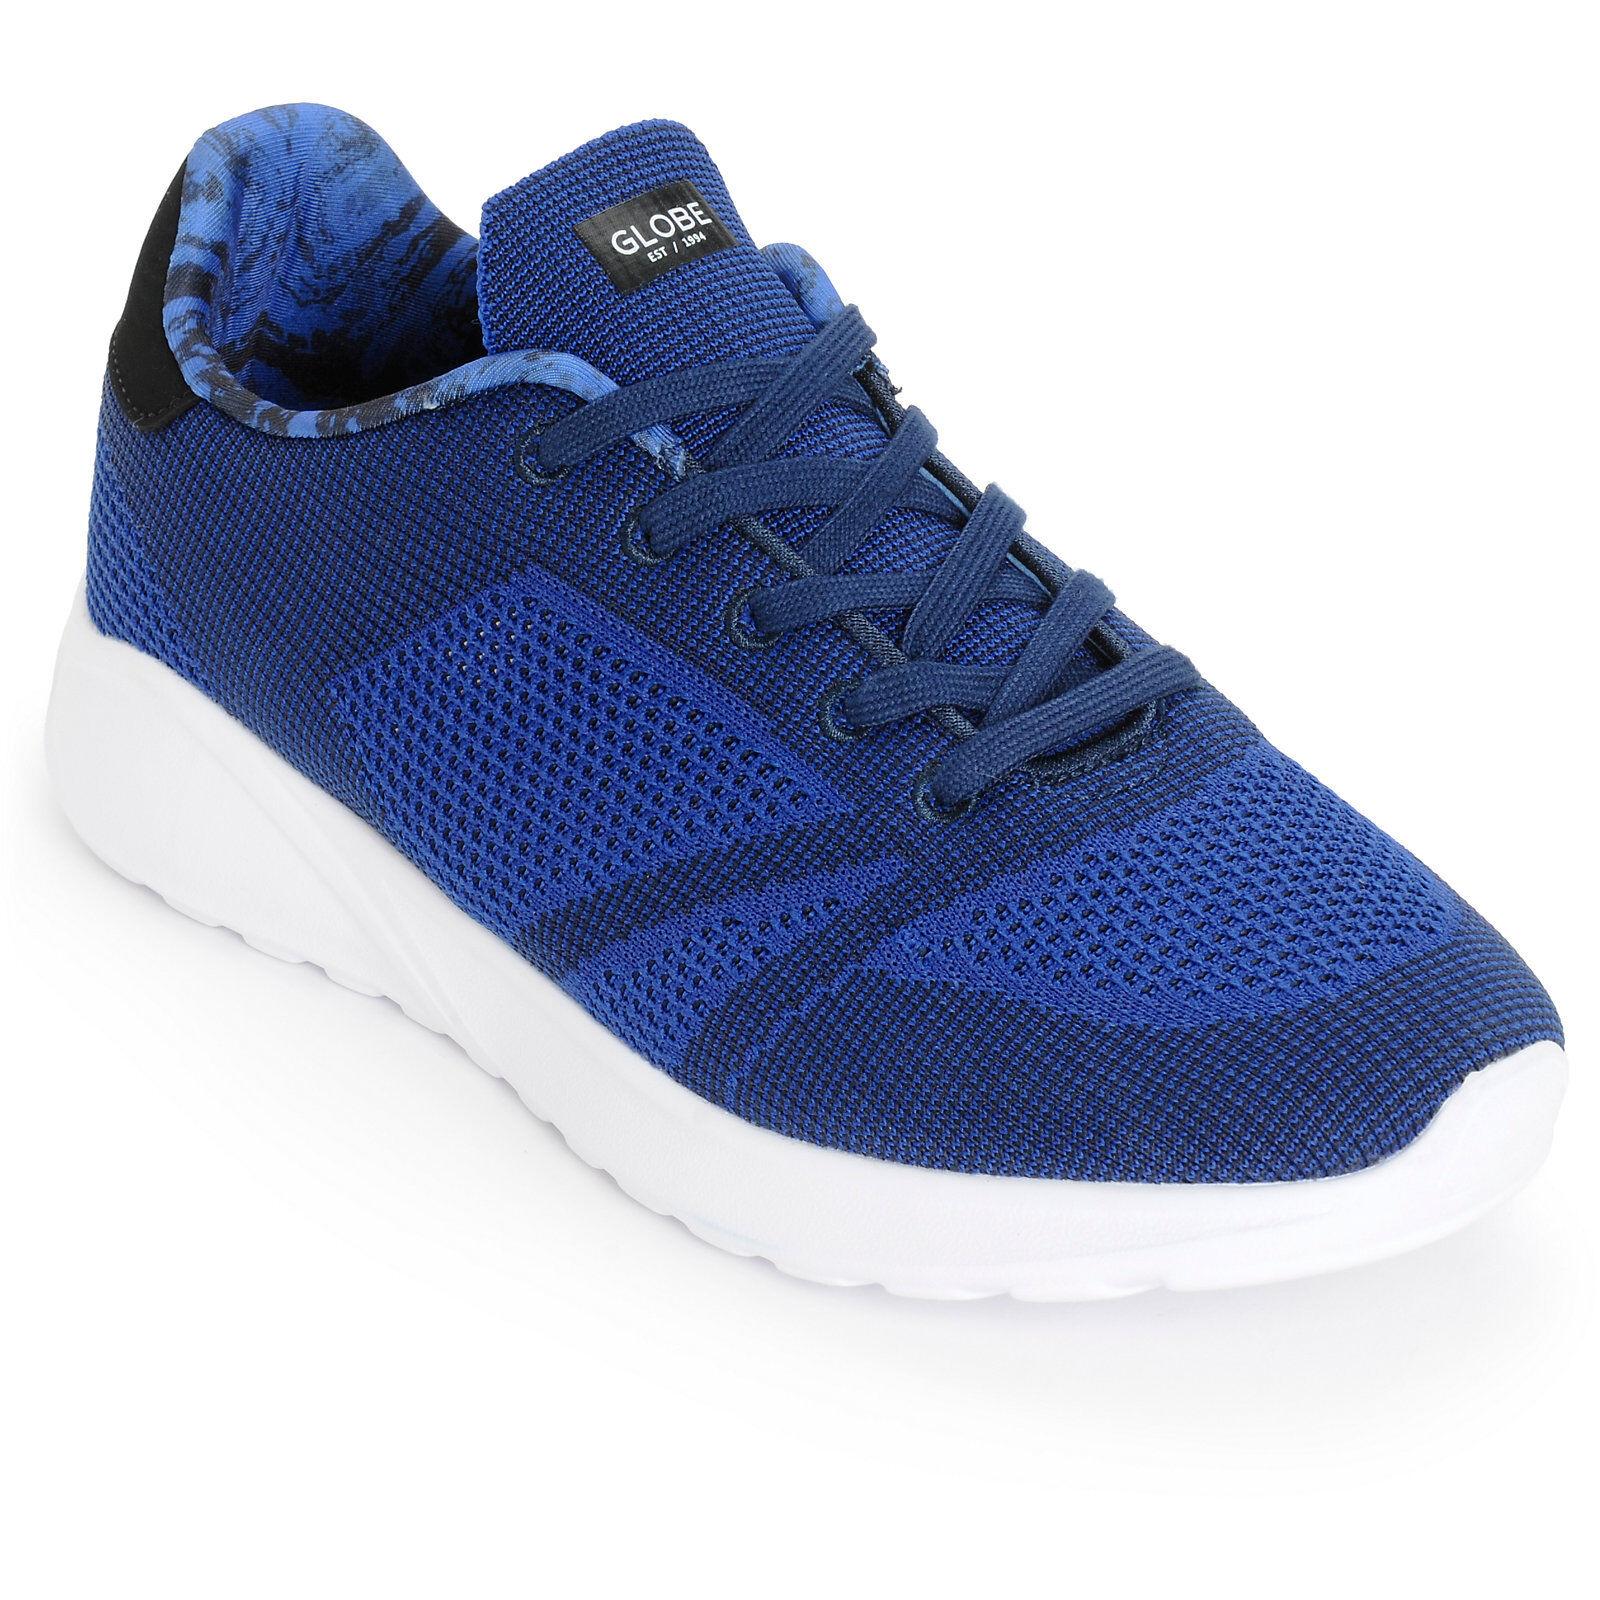 the latest 229e8 4e8a3 New Globe Avante Mens Mens Mens Knit Running shoes NIB 4542a9